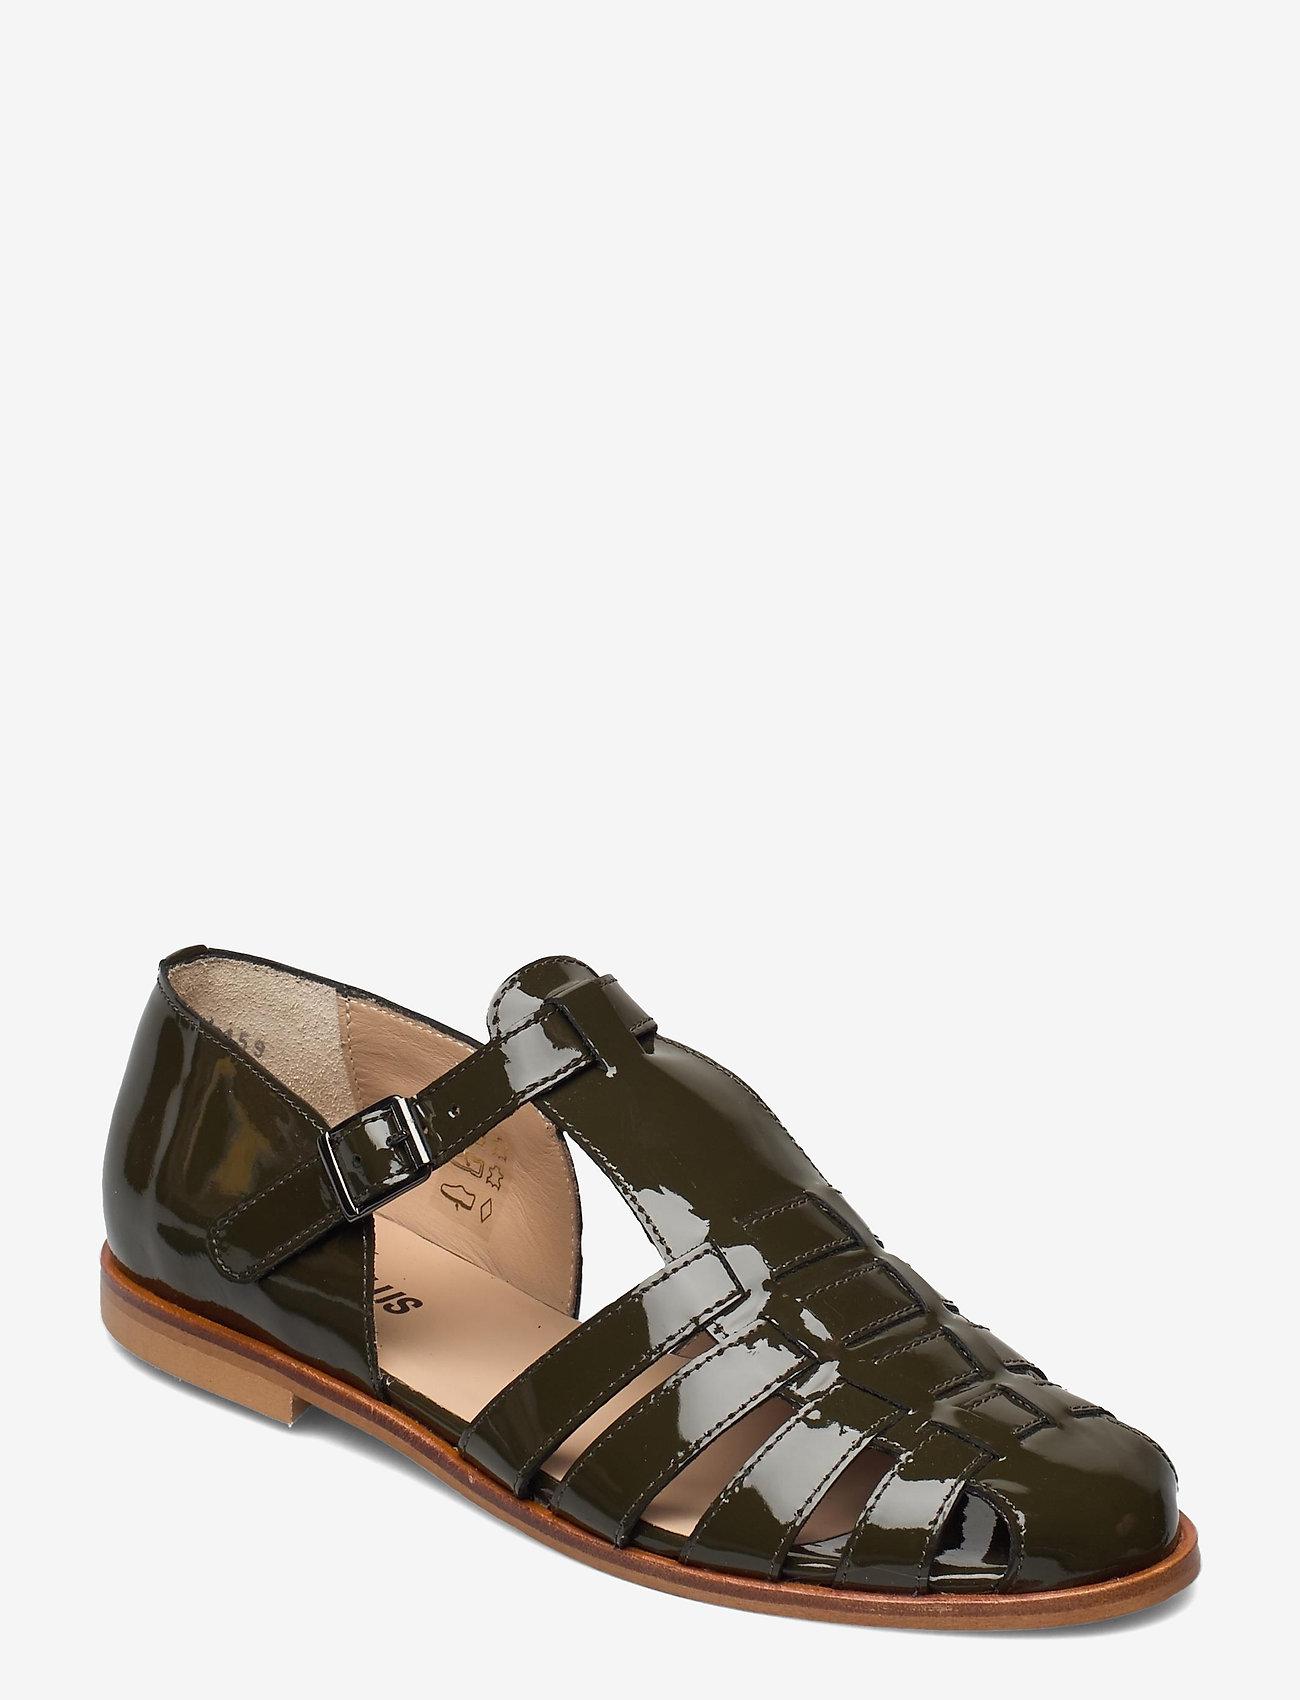 ANGULUS - Sandals - flat - closed toe - op - flache sandalen - 2345 olive - 0